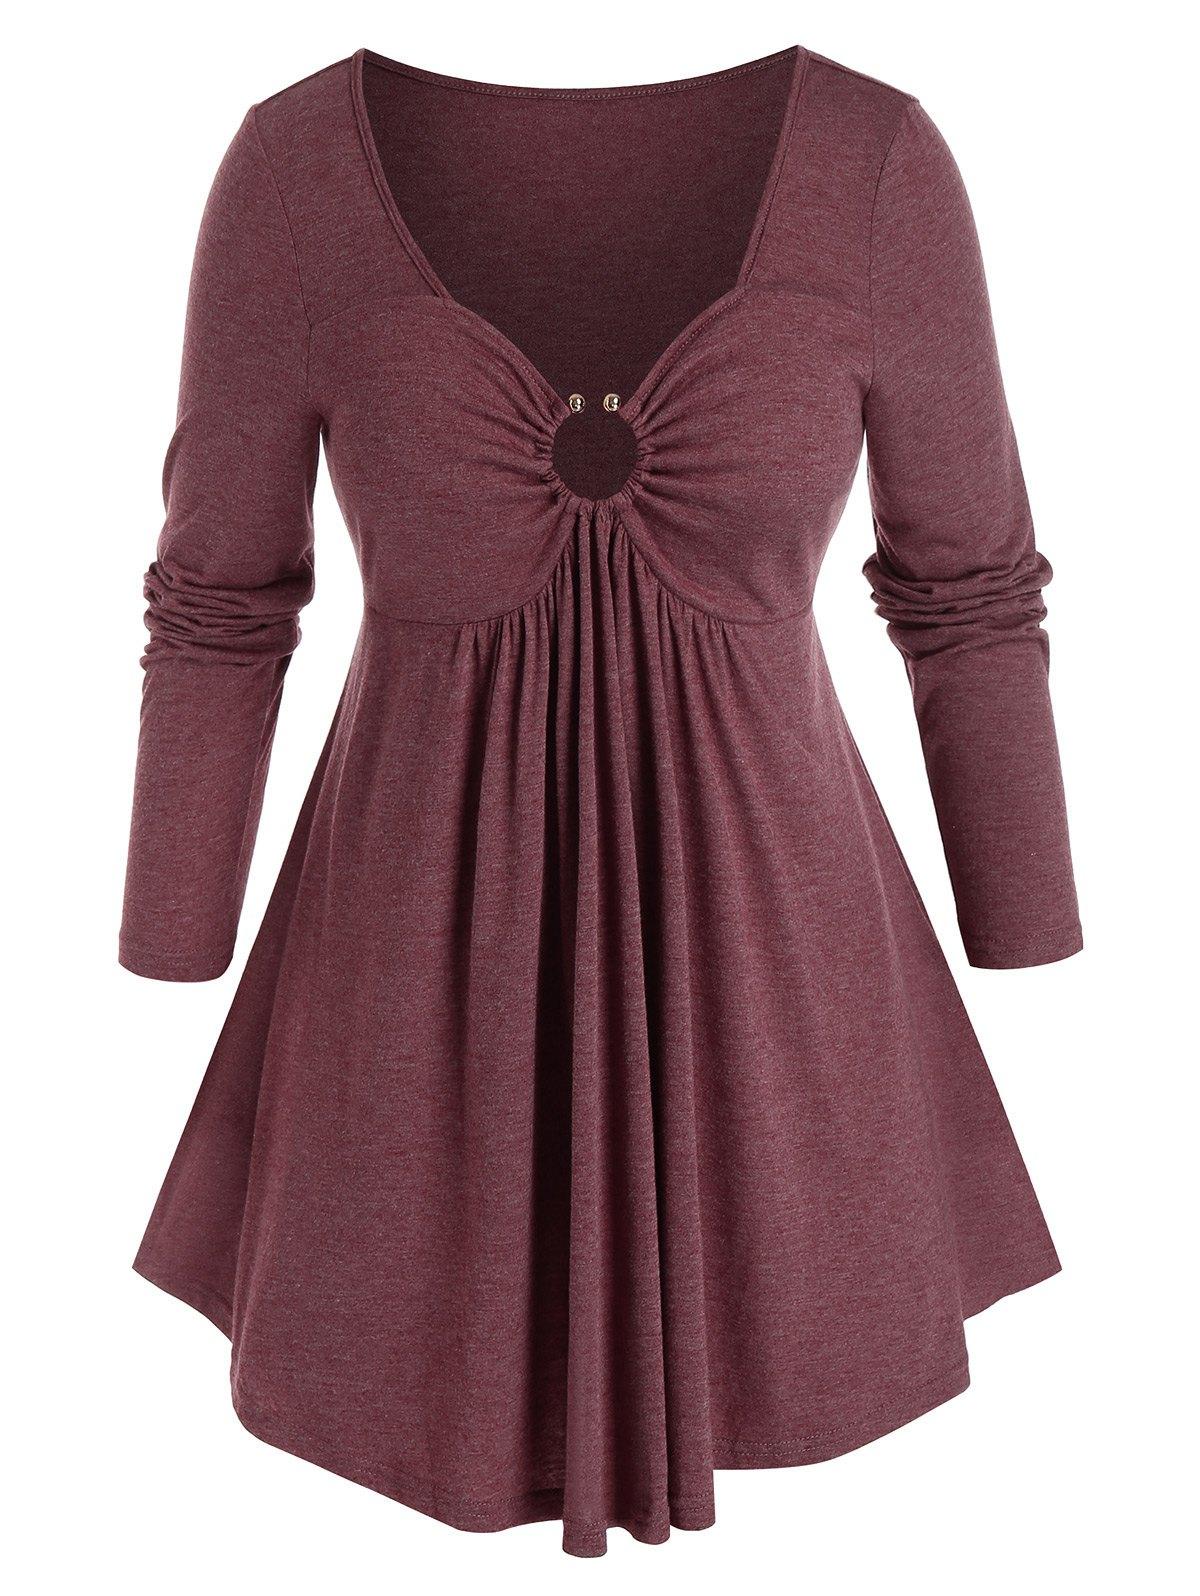 Plus Size O Ring Heathered Empire Waist T Shirt